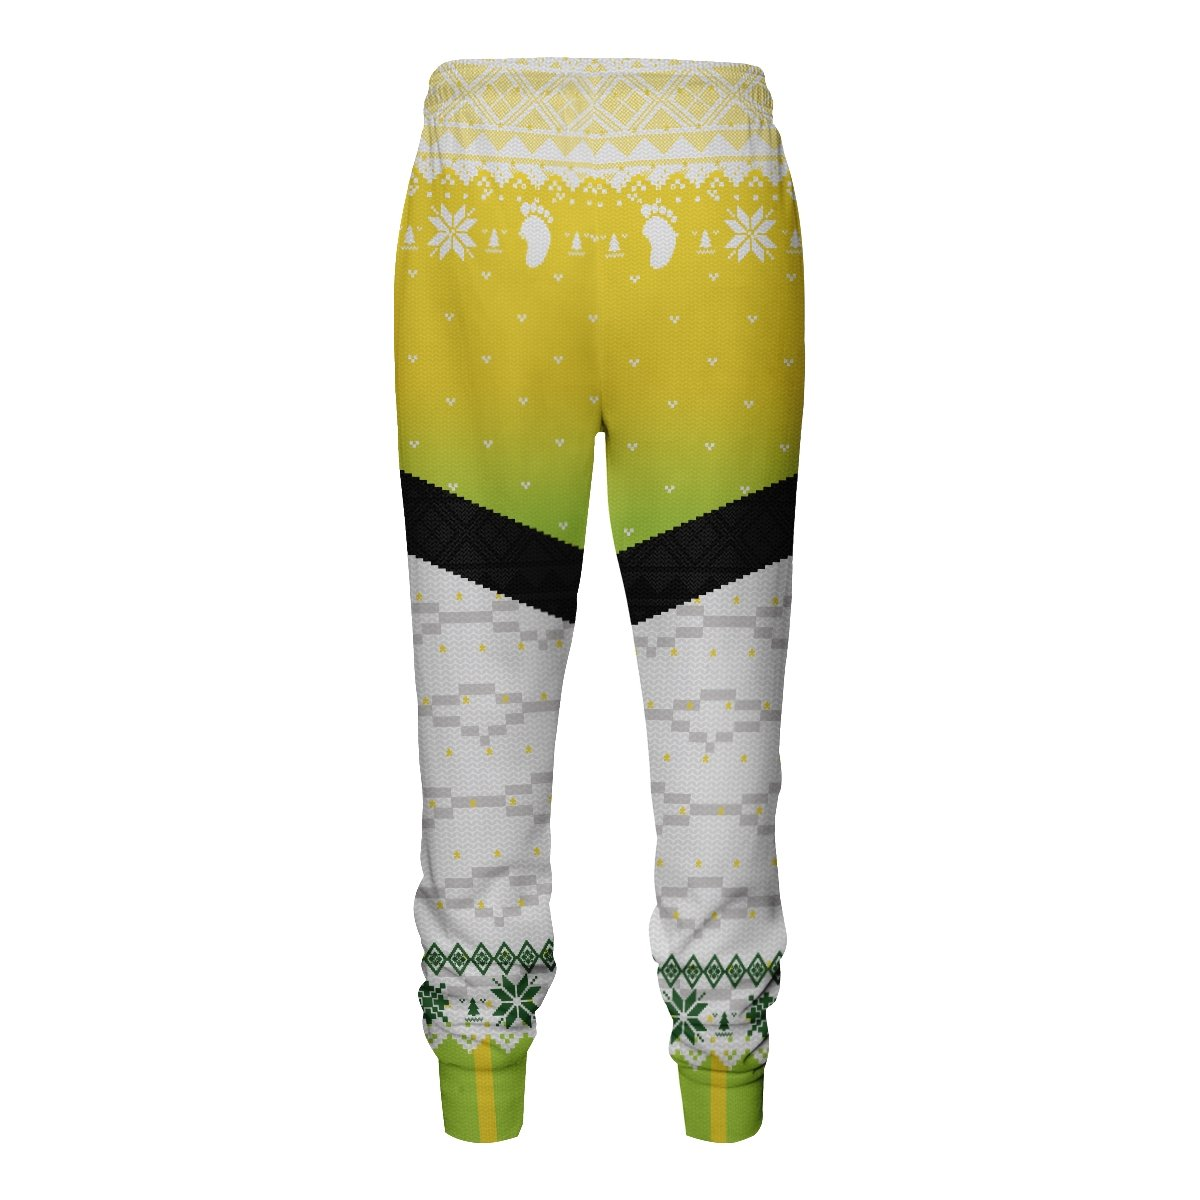 team itachiyama christmas jogger pants 251022 - Otaku Treat